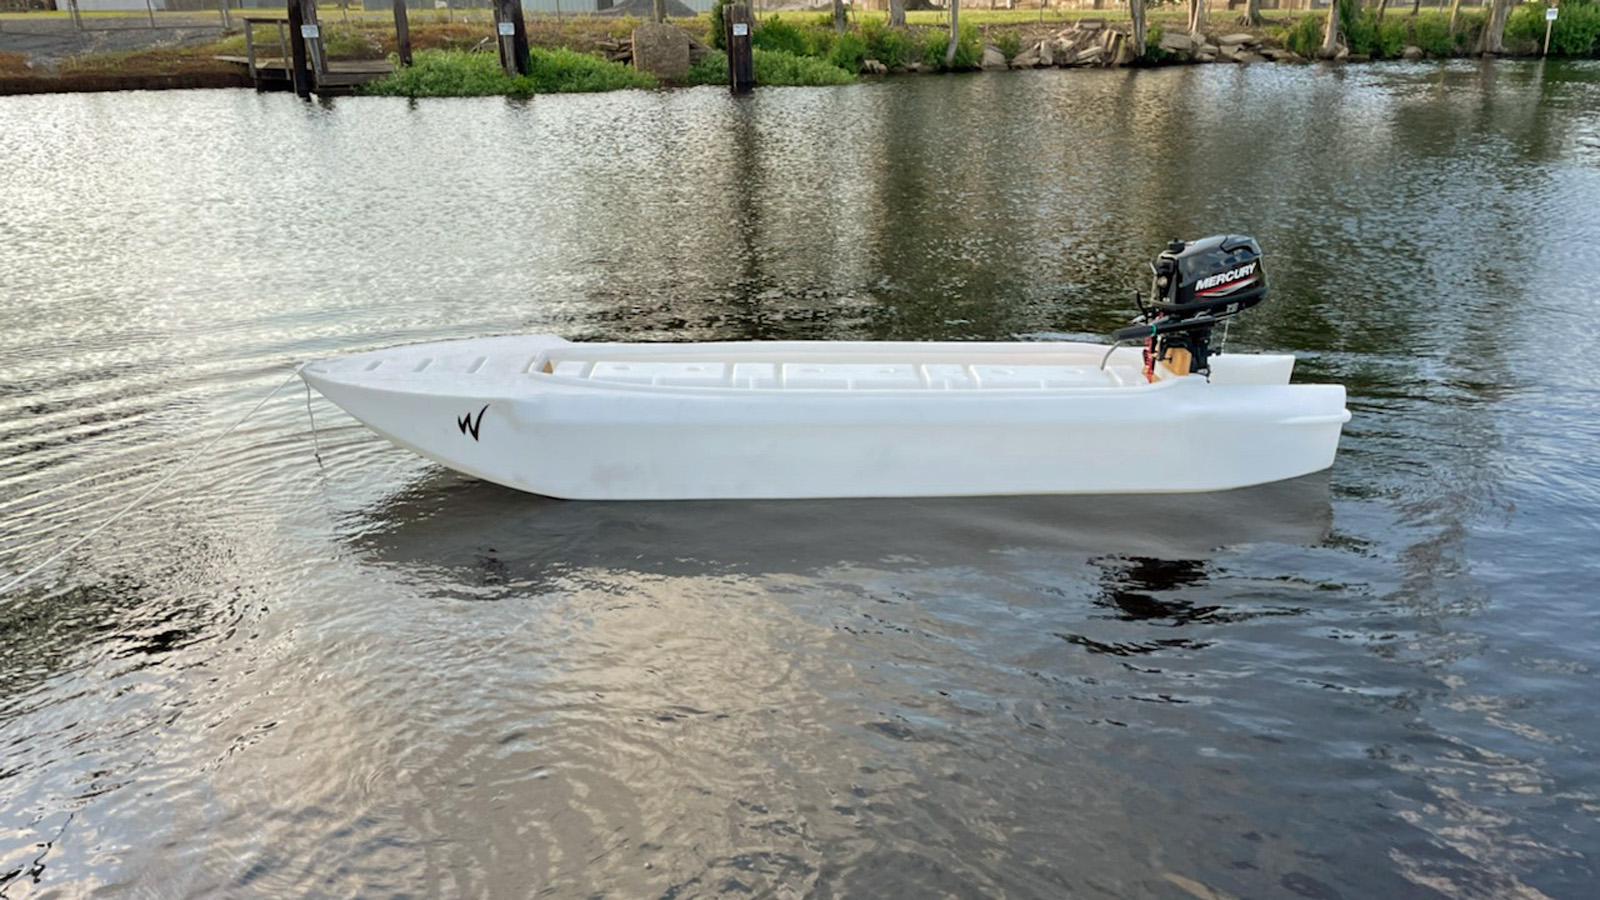 Wavewalk S4 with 6 HP Mercury outboard motor - south Louisiana